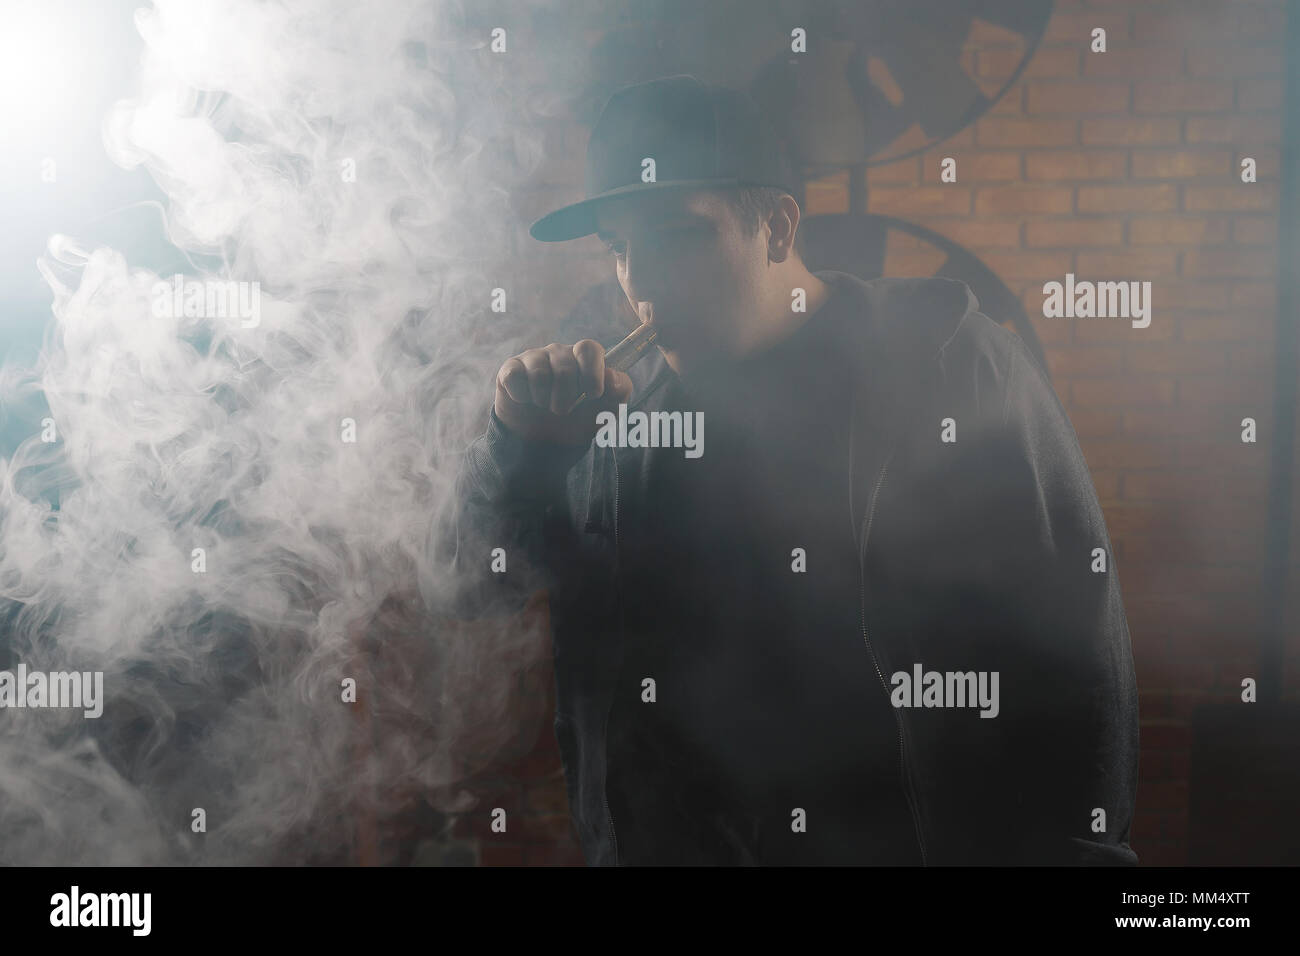 A cloud of vapor  Vaping man holding a mod  Brick background  Vape